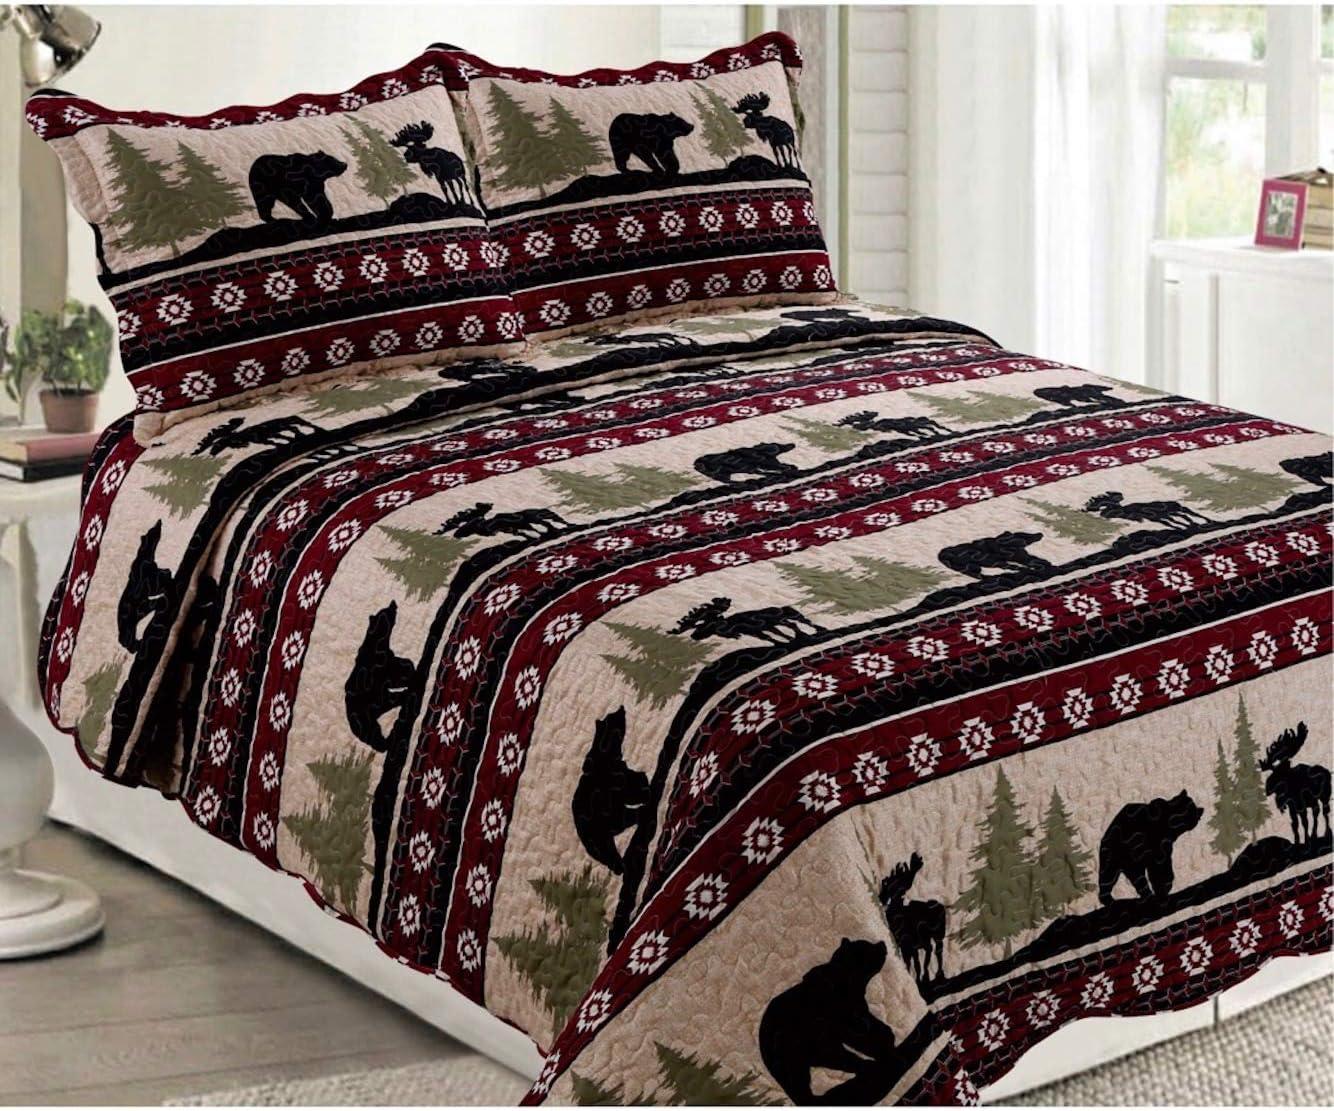 Elegant Home Native American Wildlife Bear and Moose Wilderness Cabin Lodge Life Beige Green Black Burgundy Rustic Western Design 3 Piece Coverlet Bedspread Quilt # 017 (King Size)